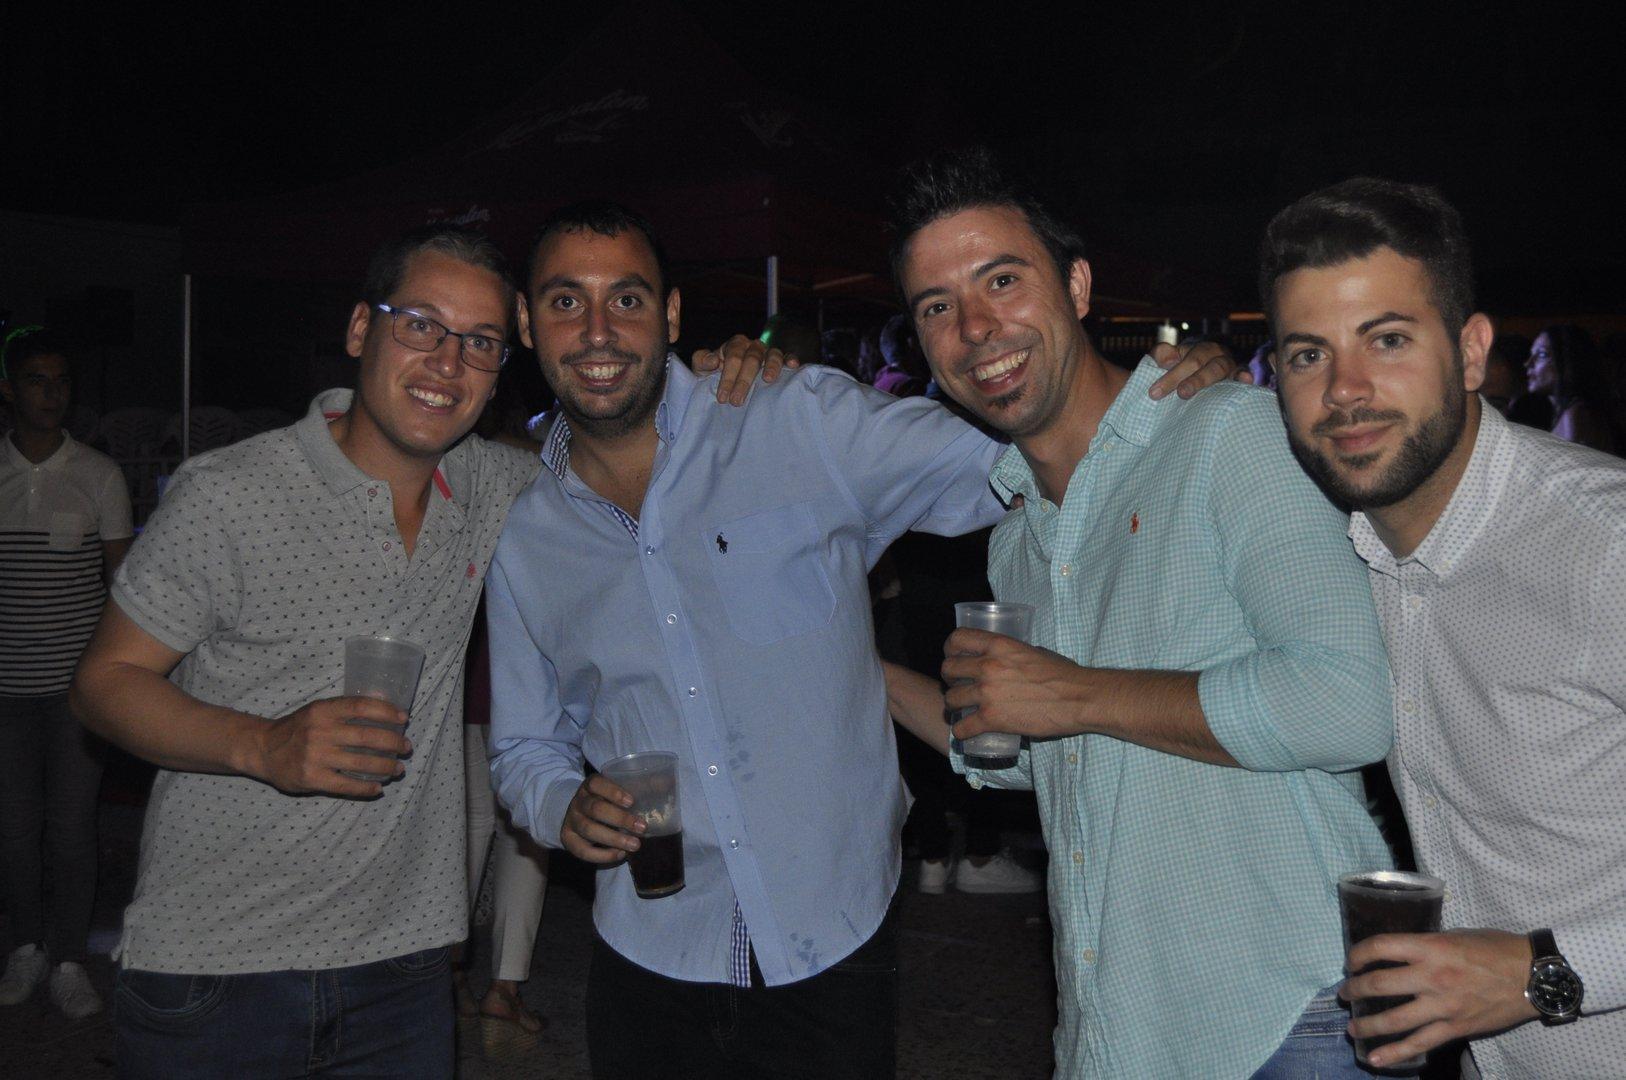 Sábado de Fiestas Archena 2017